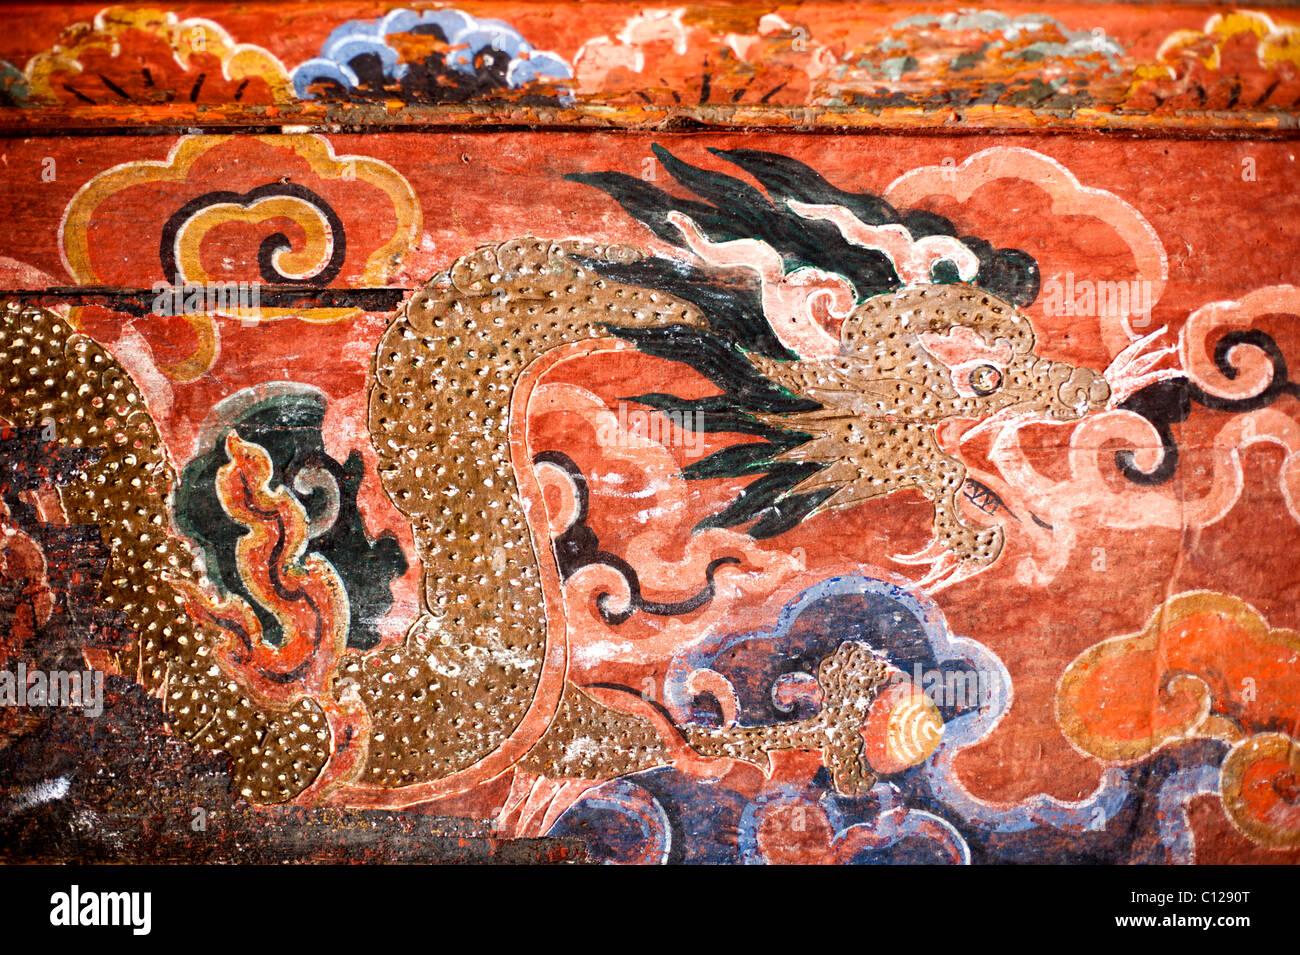 Bhutanese temple art depicting the Thunder Dragon, representative of the Kingdom of Bhutan - Stock Image